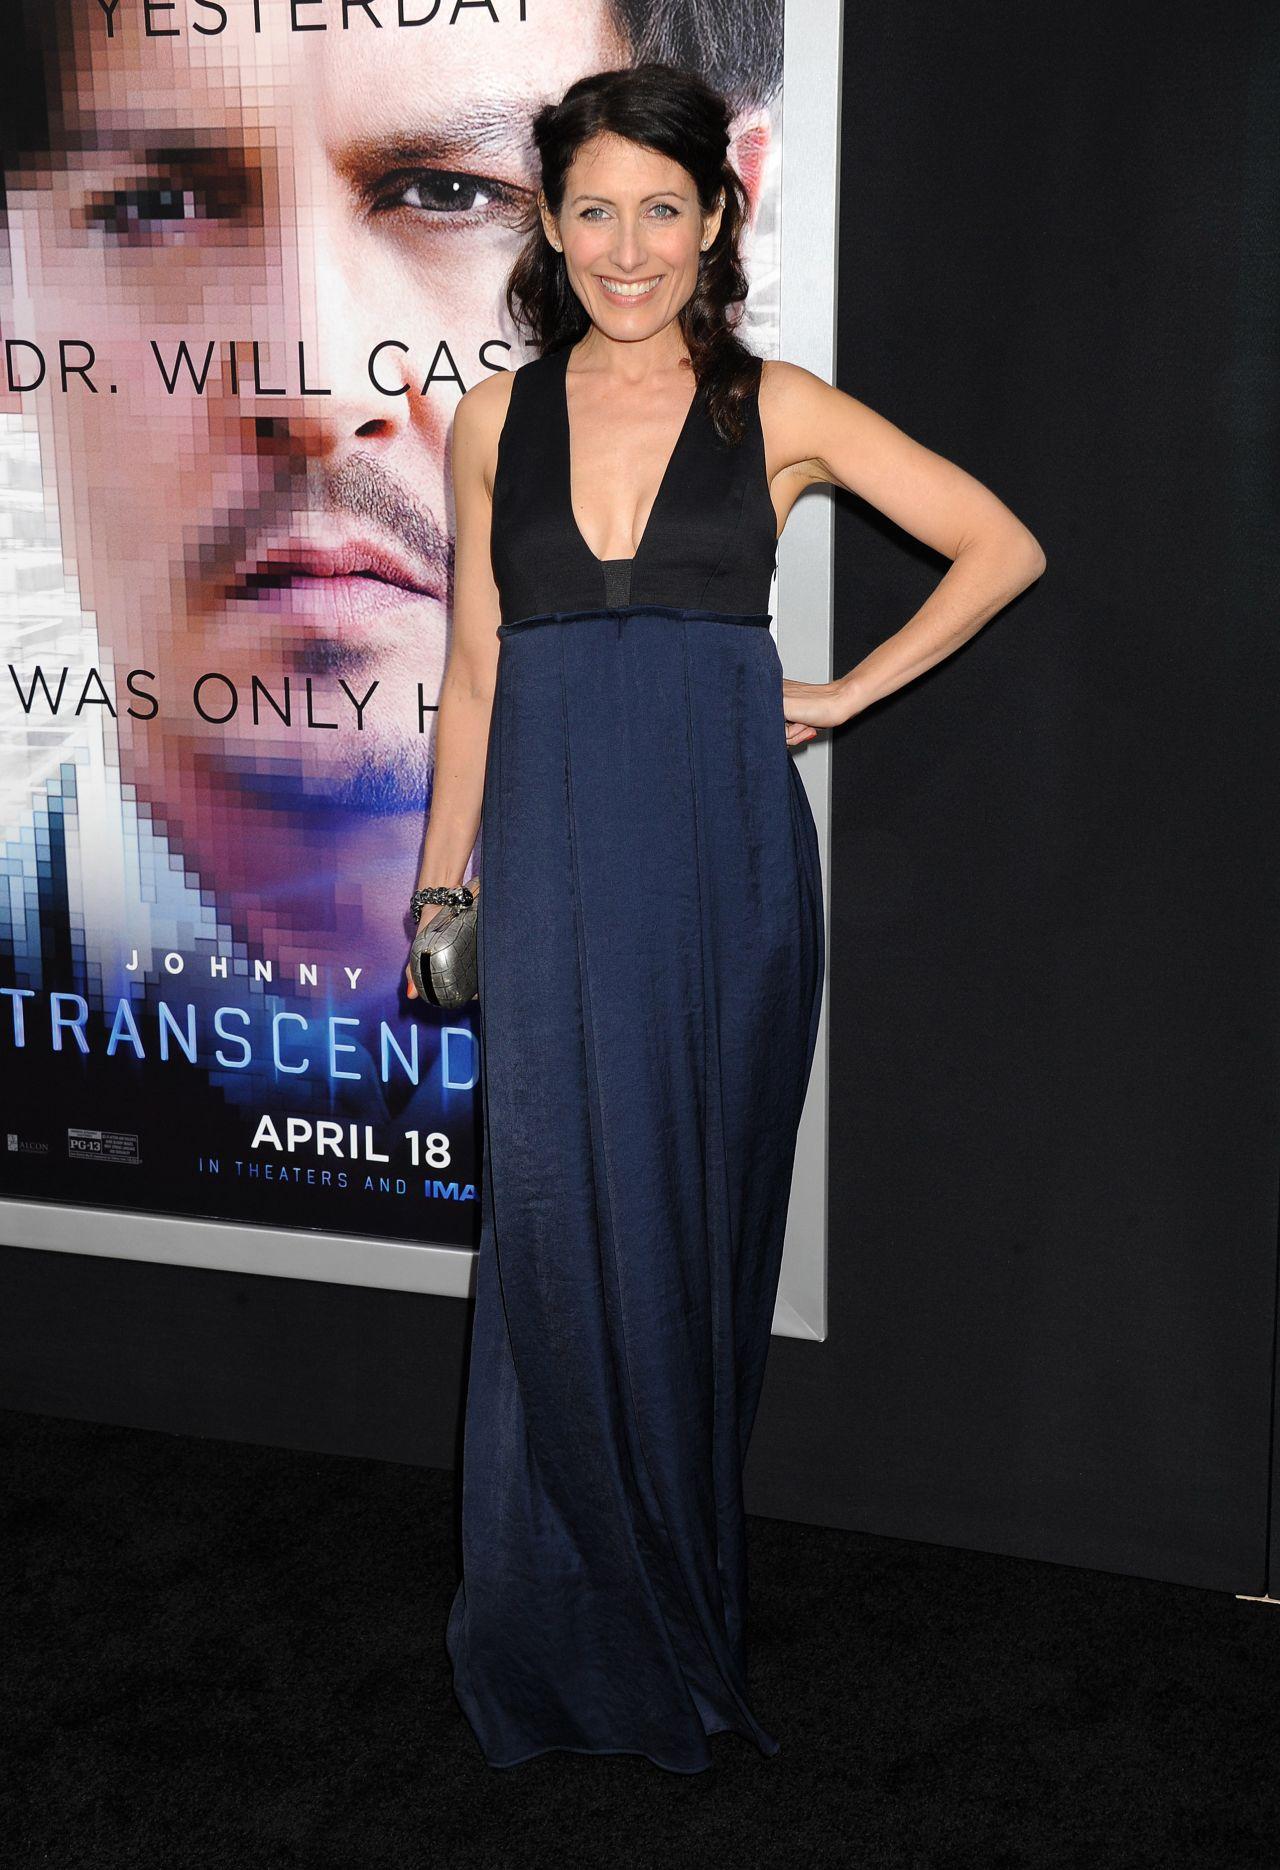 TRANSCENDENCE Premiere in Los Angeles – Lisa Edelstein